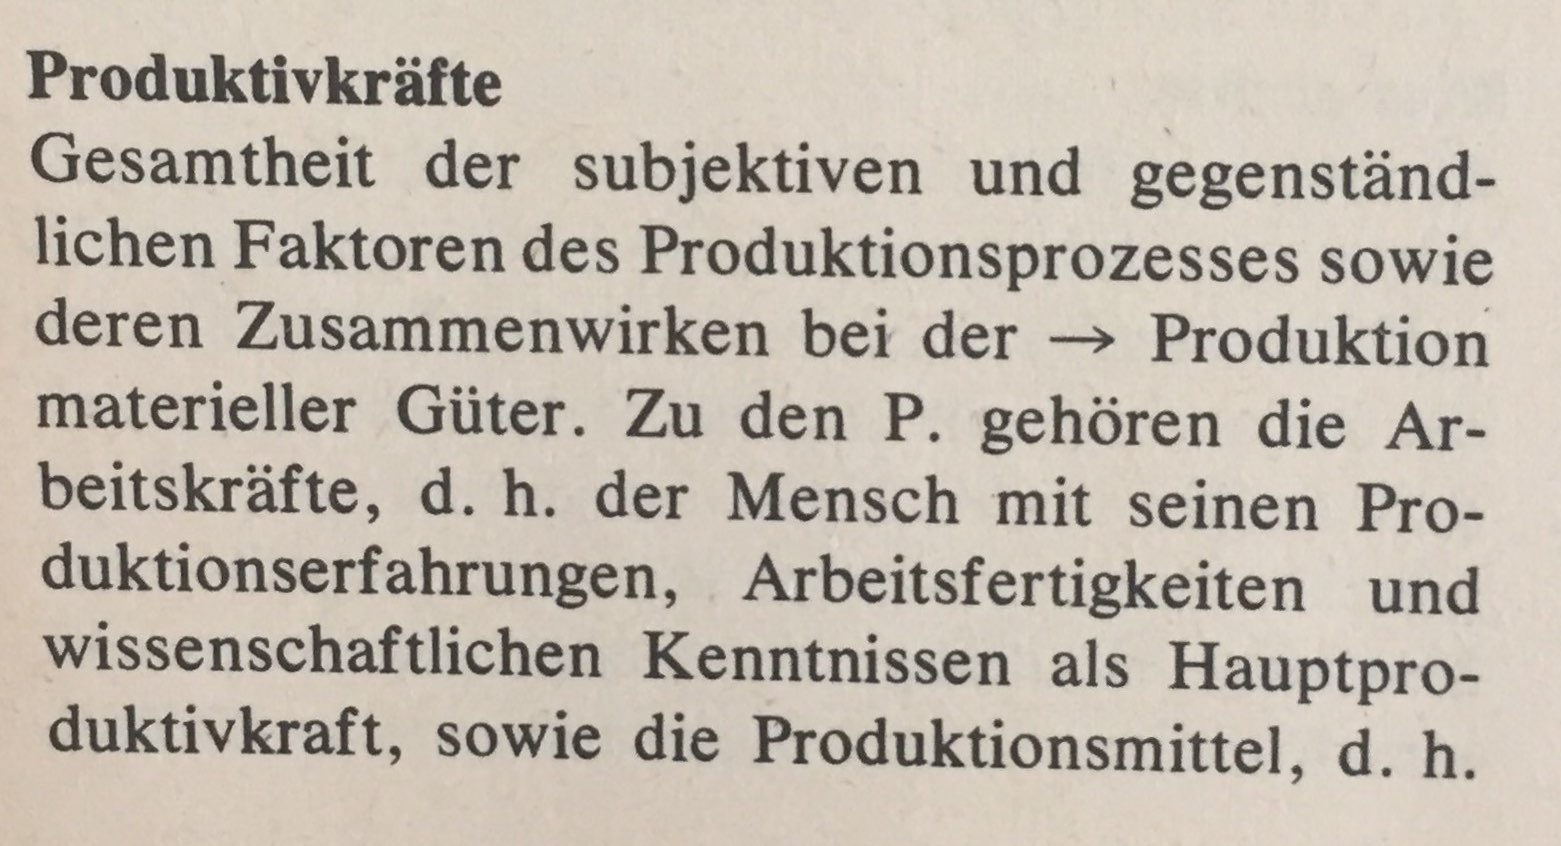 Produktivkräfte 1